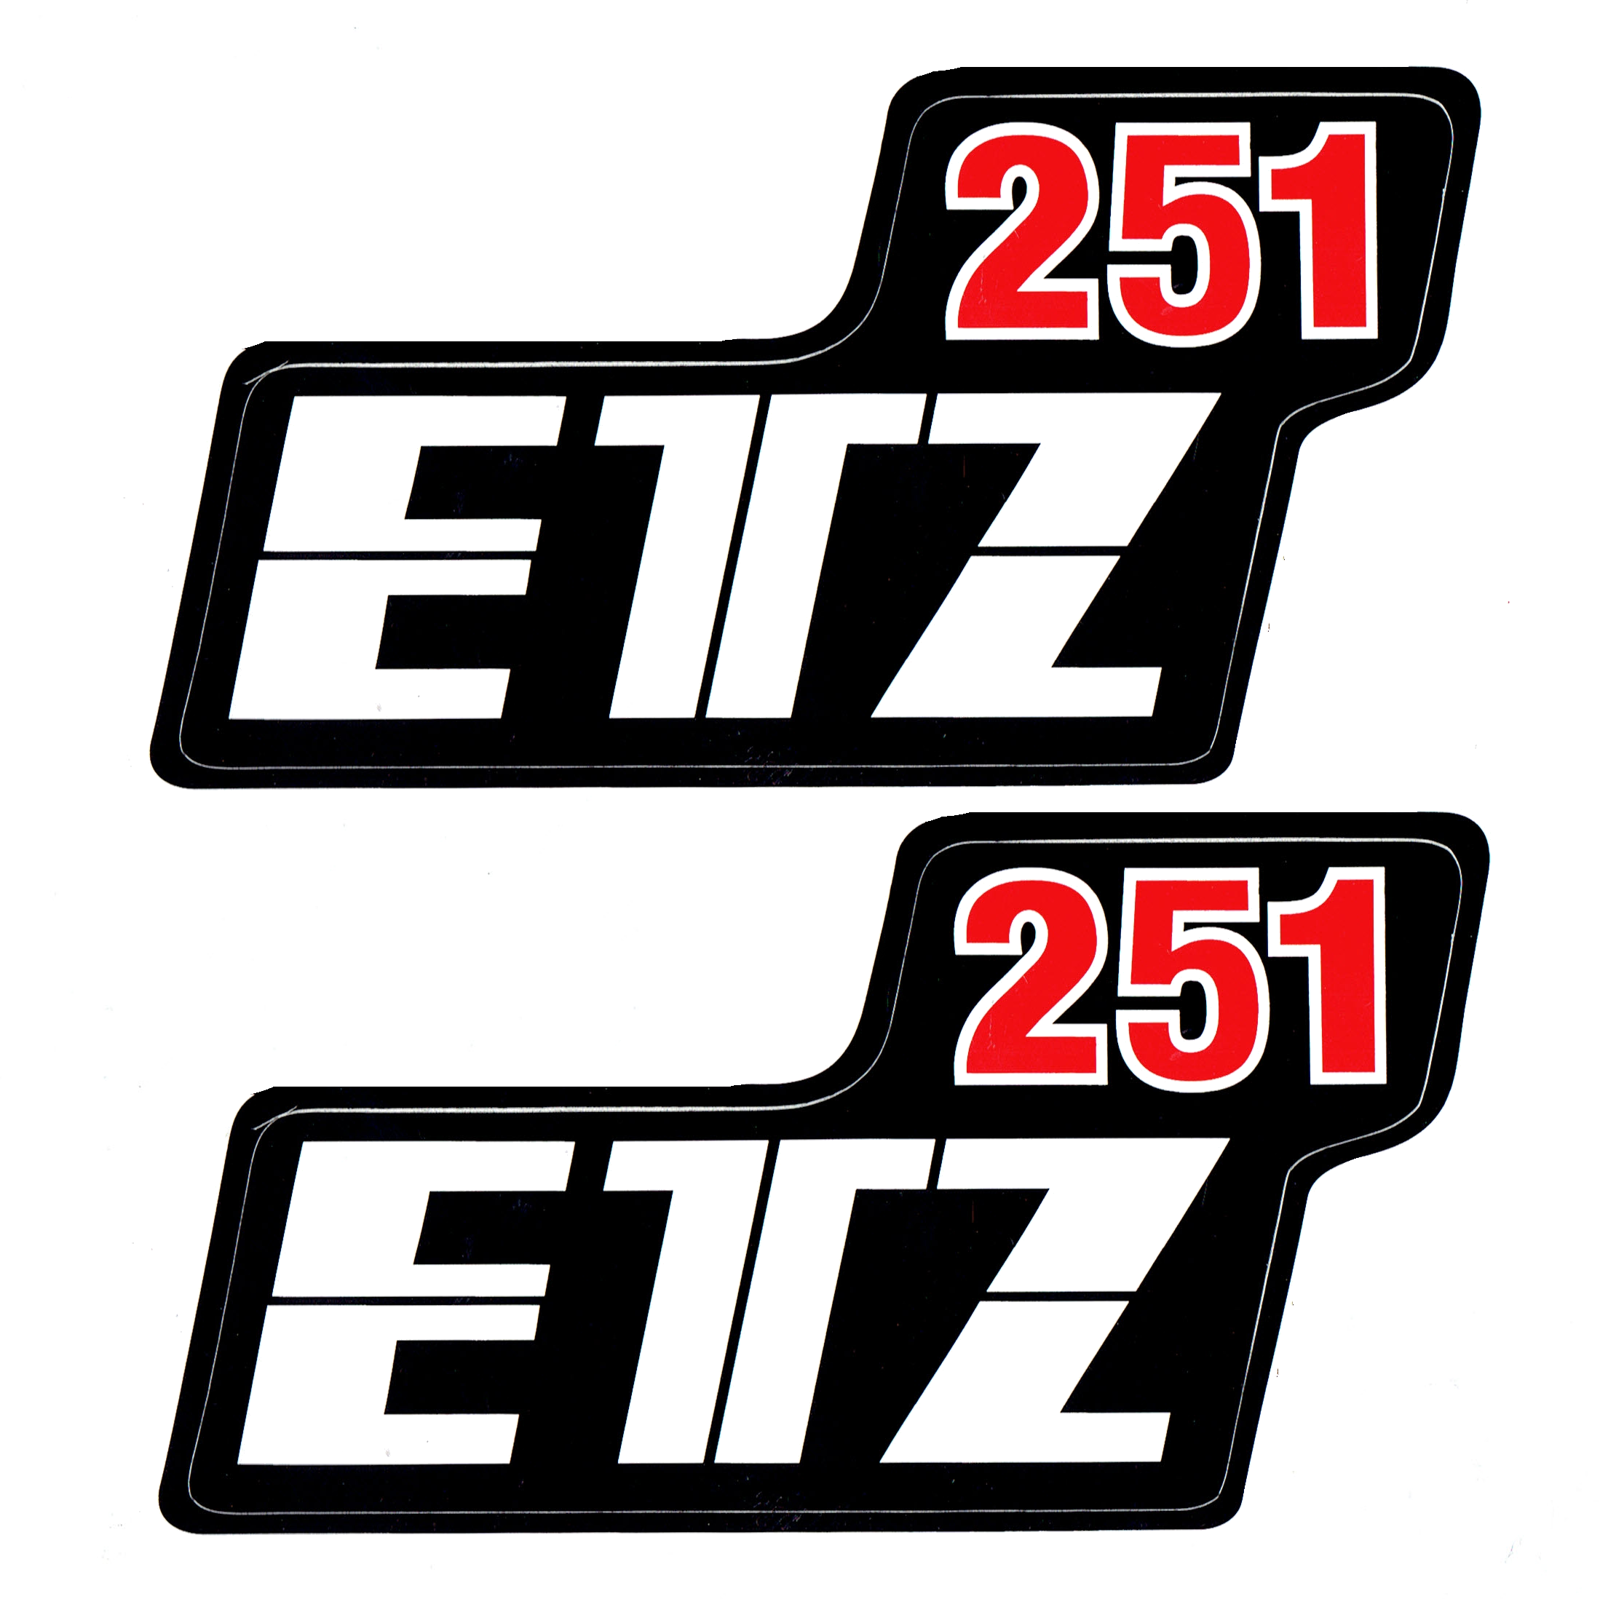 Aufkleber MZ ETZ 251